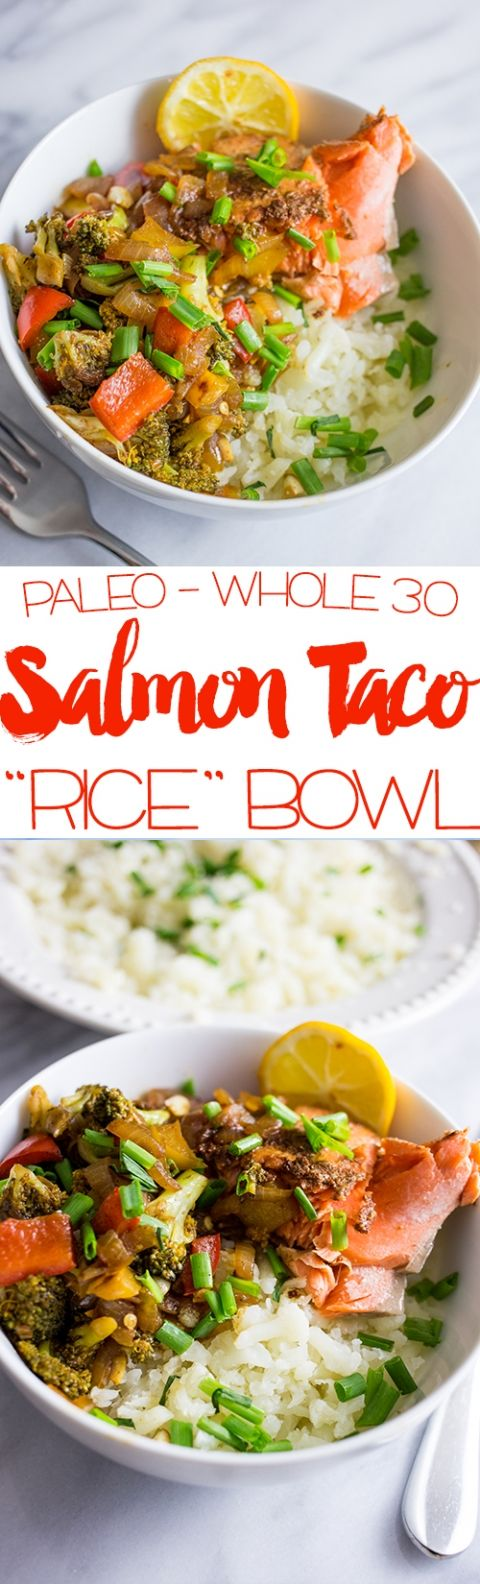 Paleo salmon taco bowls with califlower rice recipe for Wahoo fish taco recipe